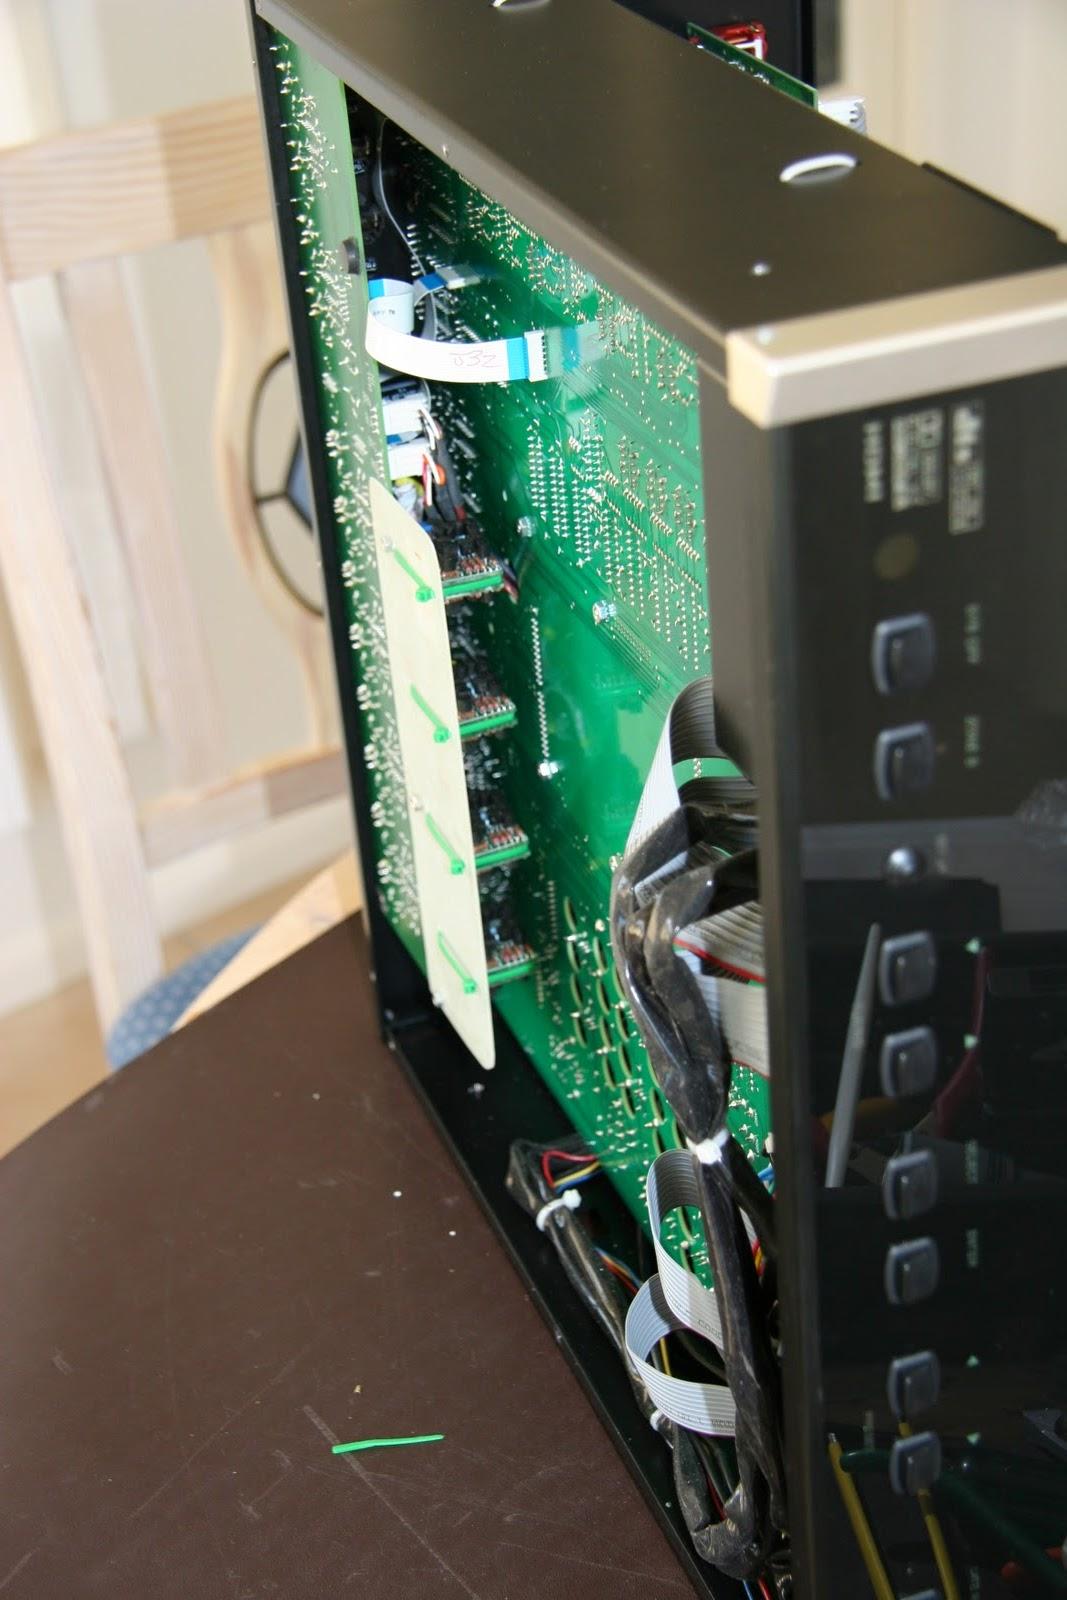 McIntosh MX-136 discrete opamp